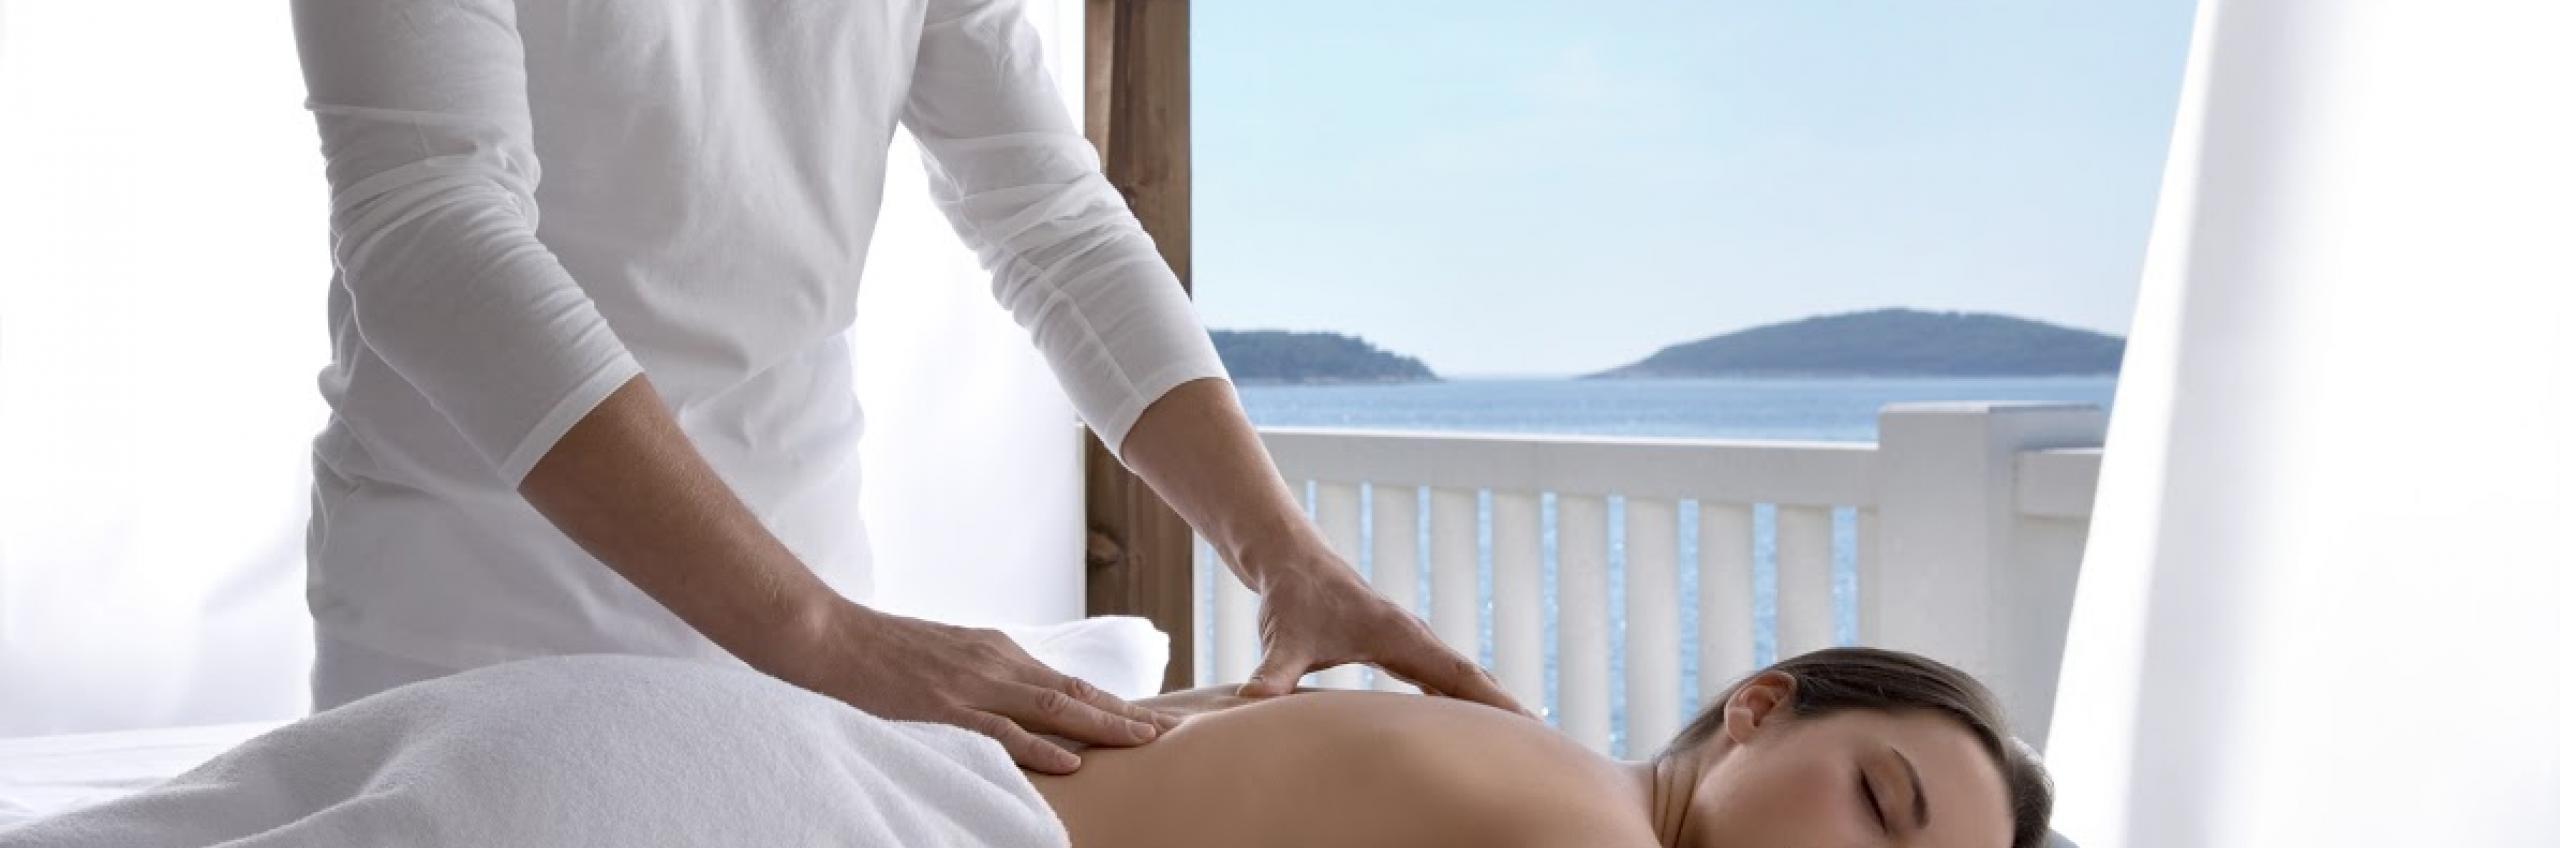 Massagem com Assinatura Sensori